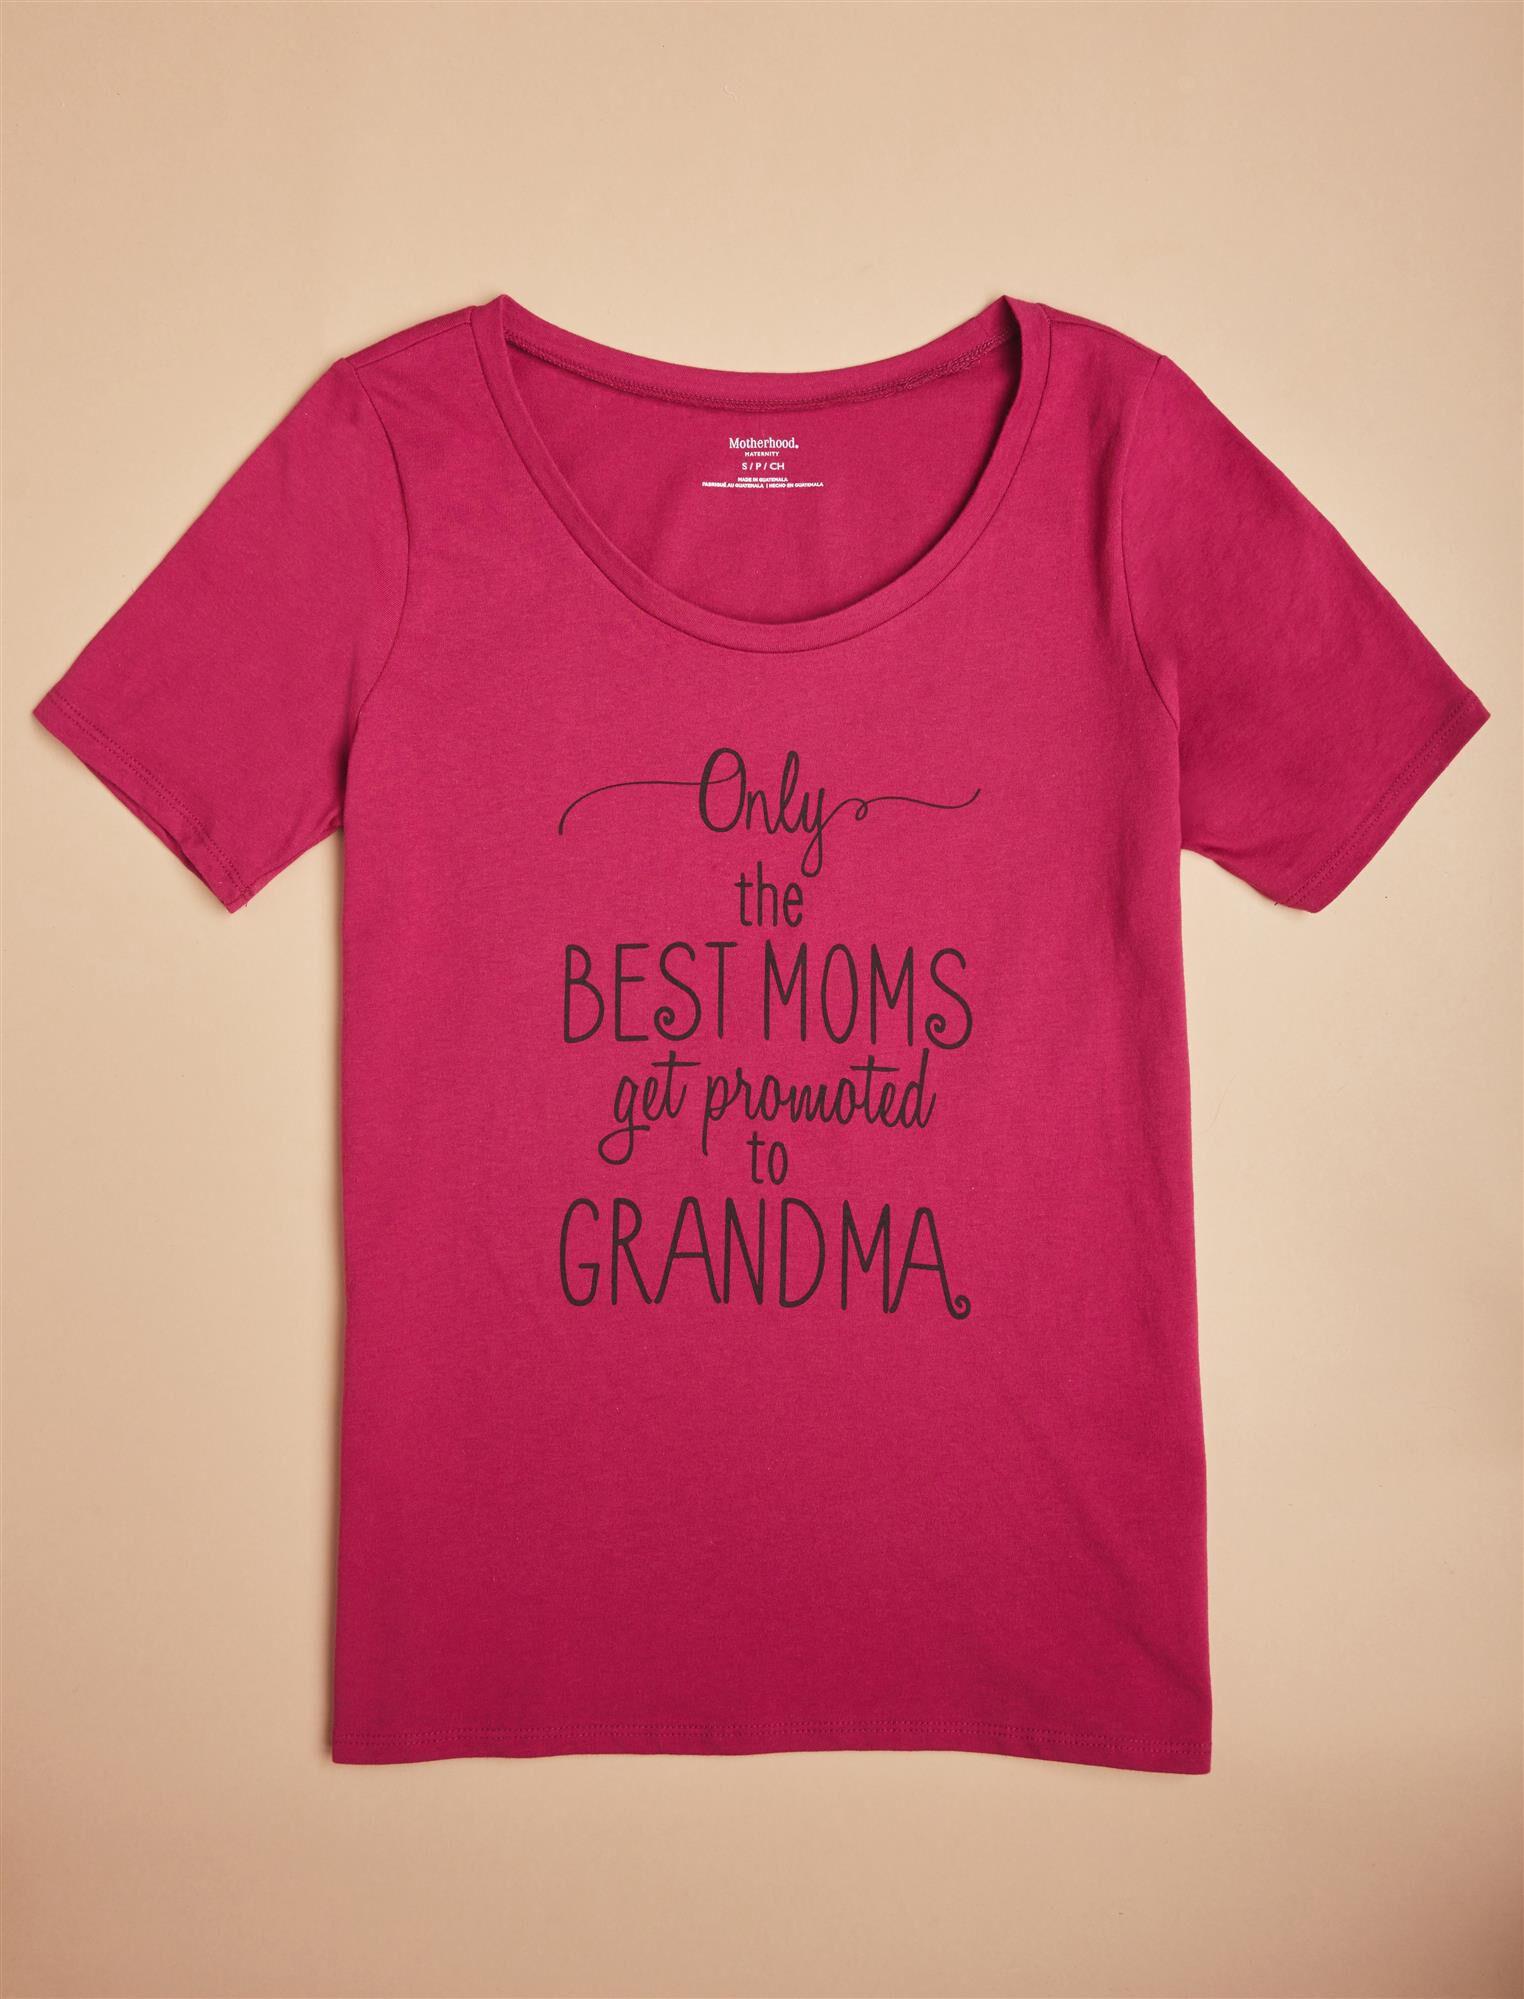 Promoted To Grandma Tee